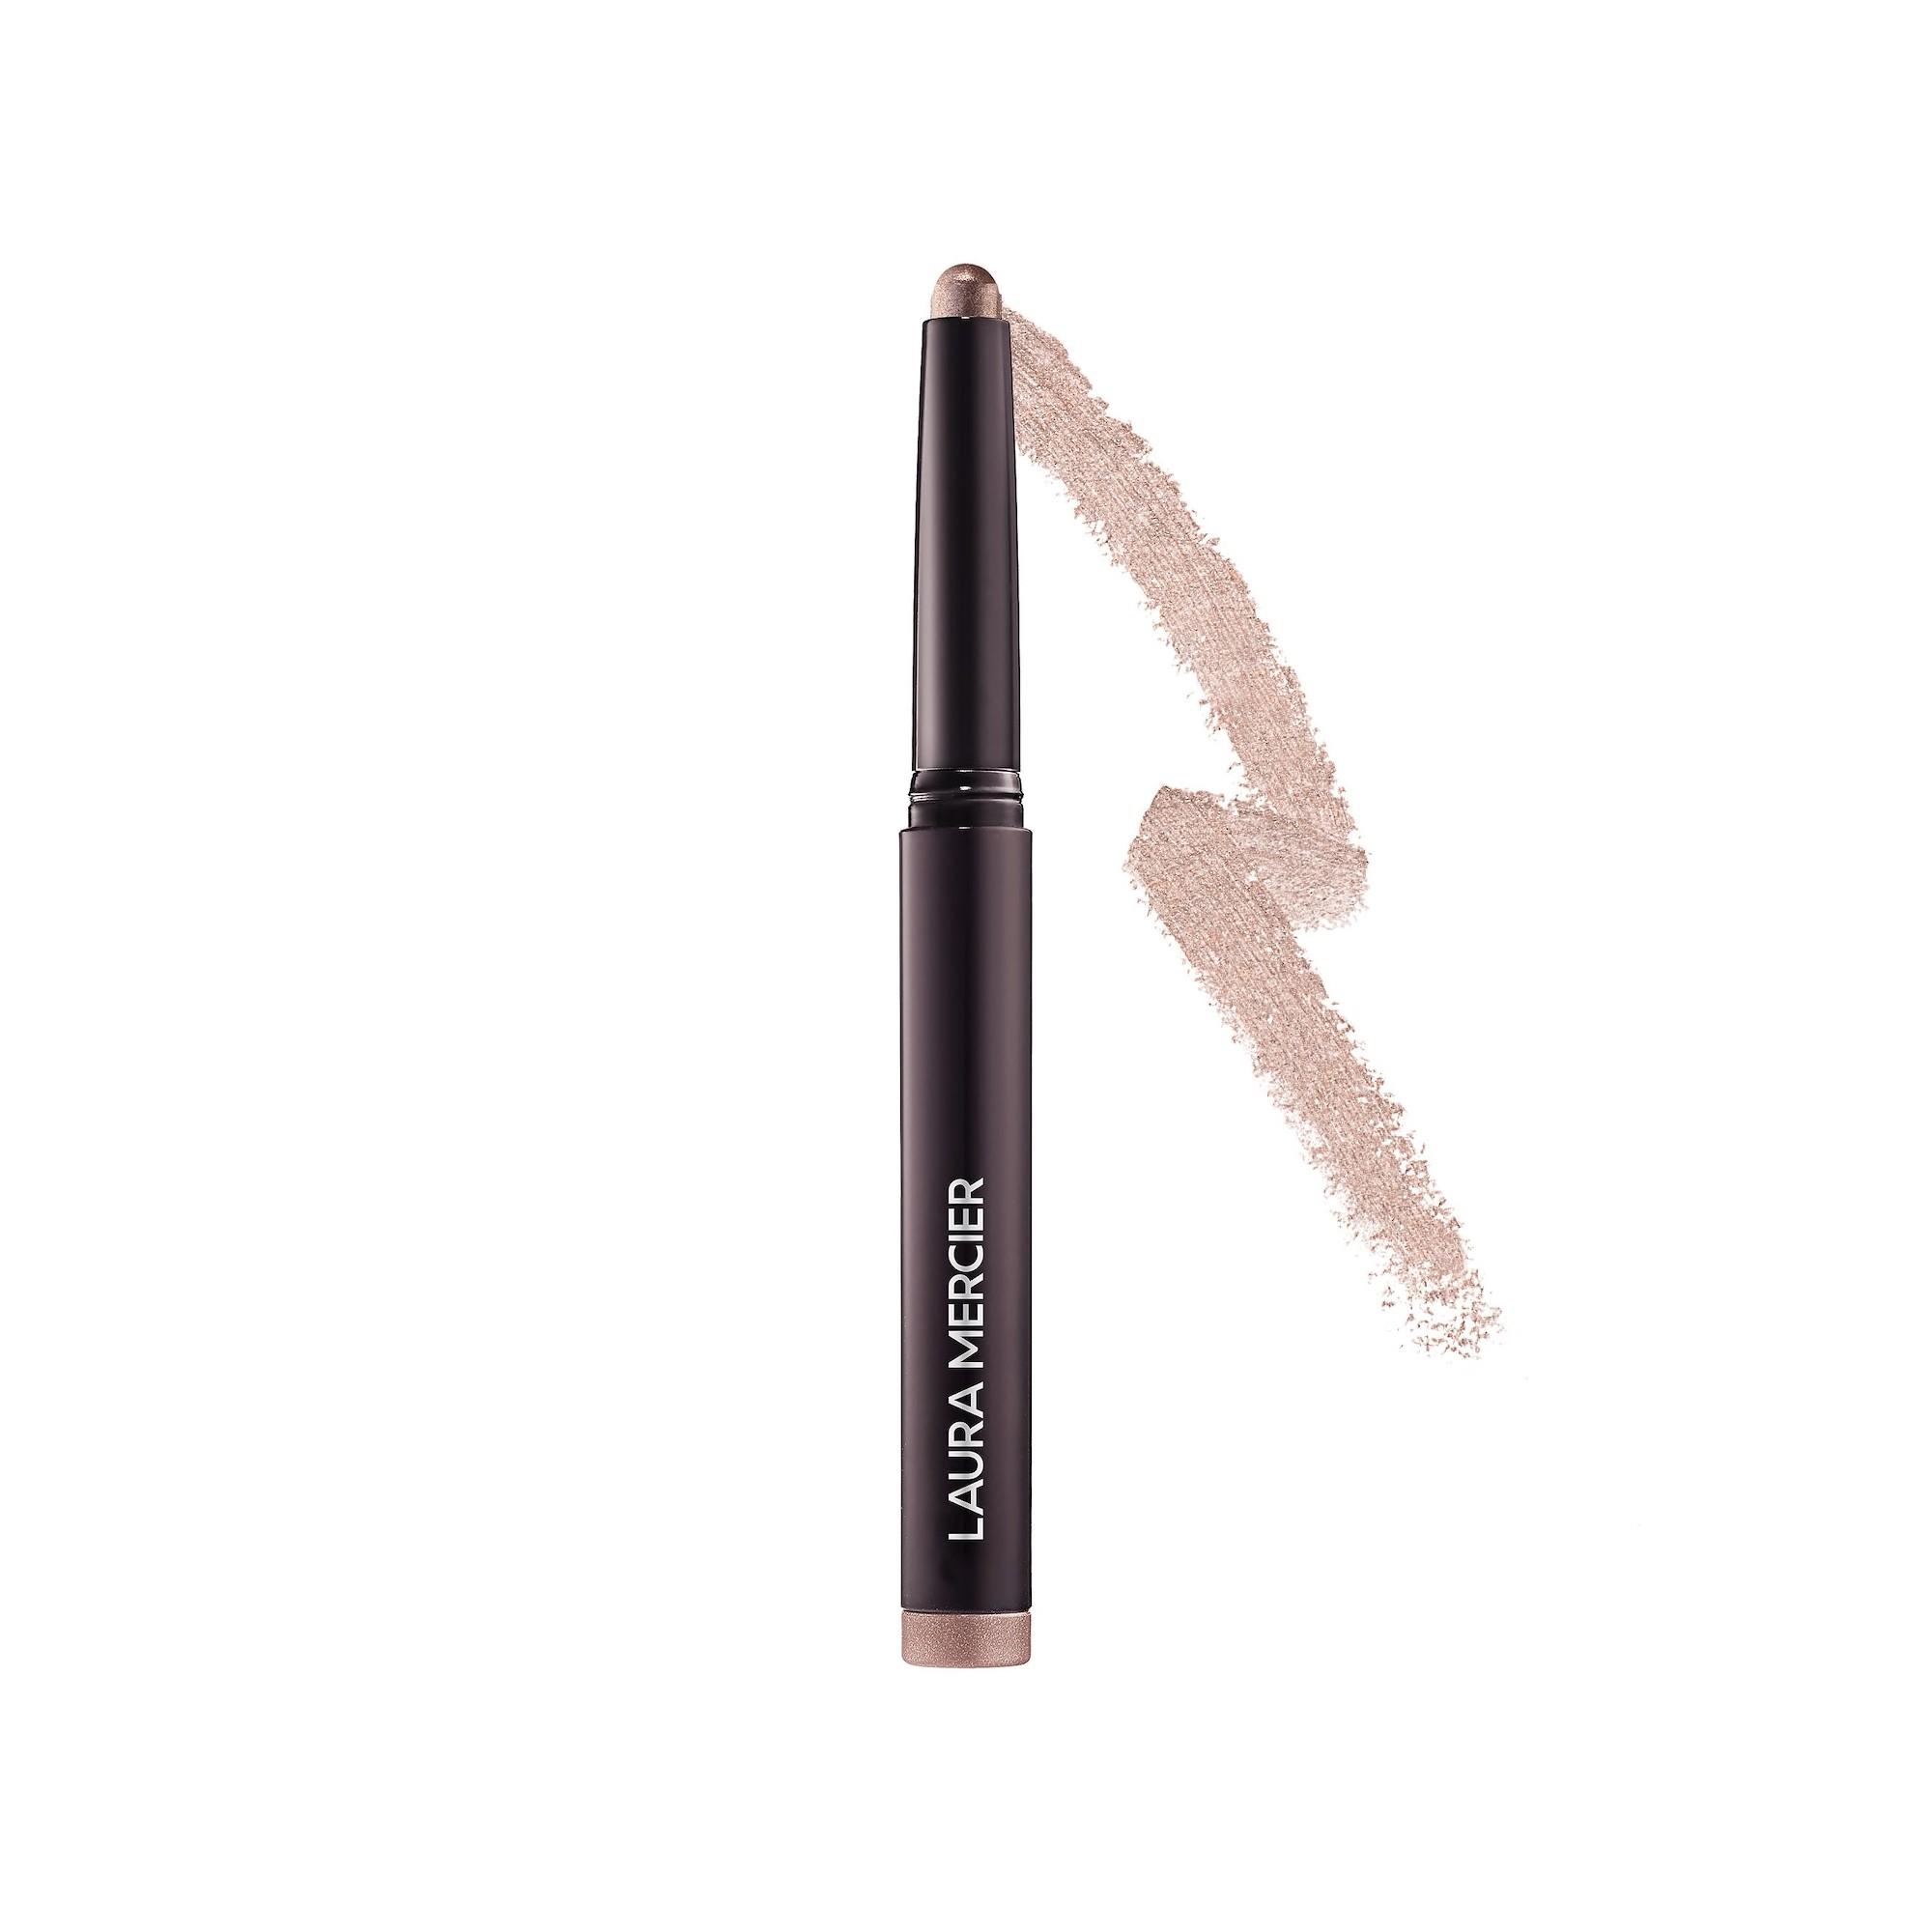 Laura Mercier Caviar Stick Eye Shadow Moonlight